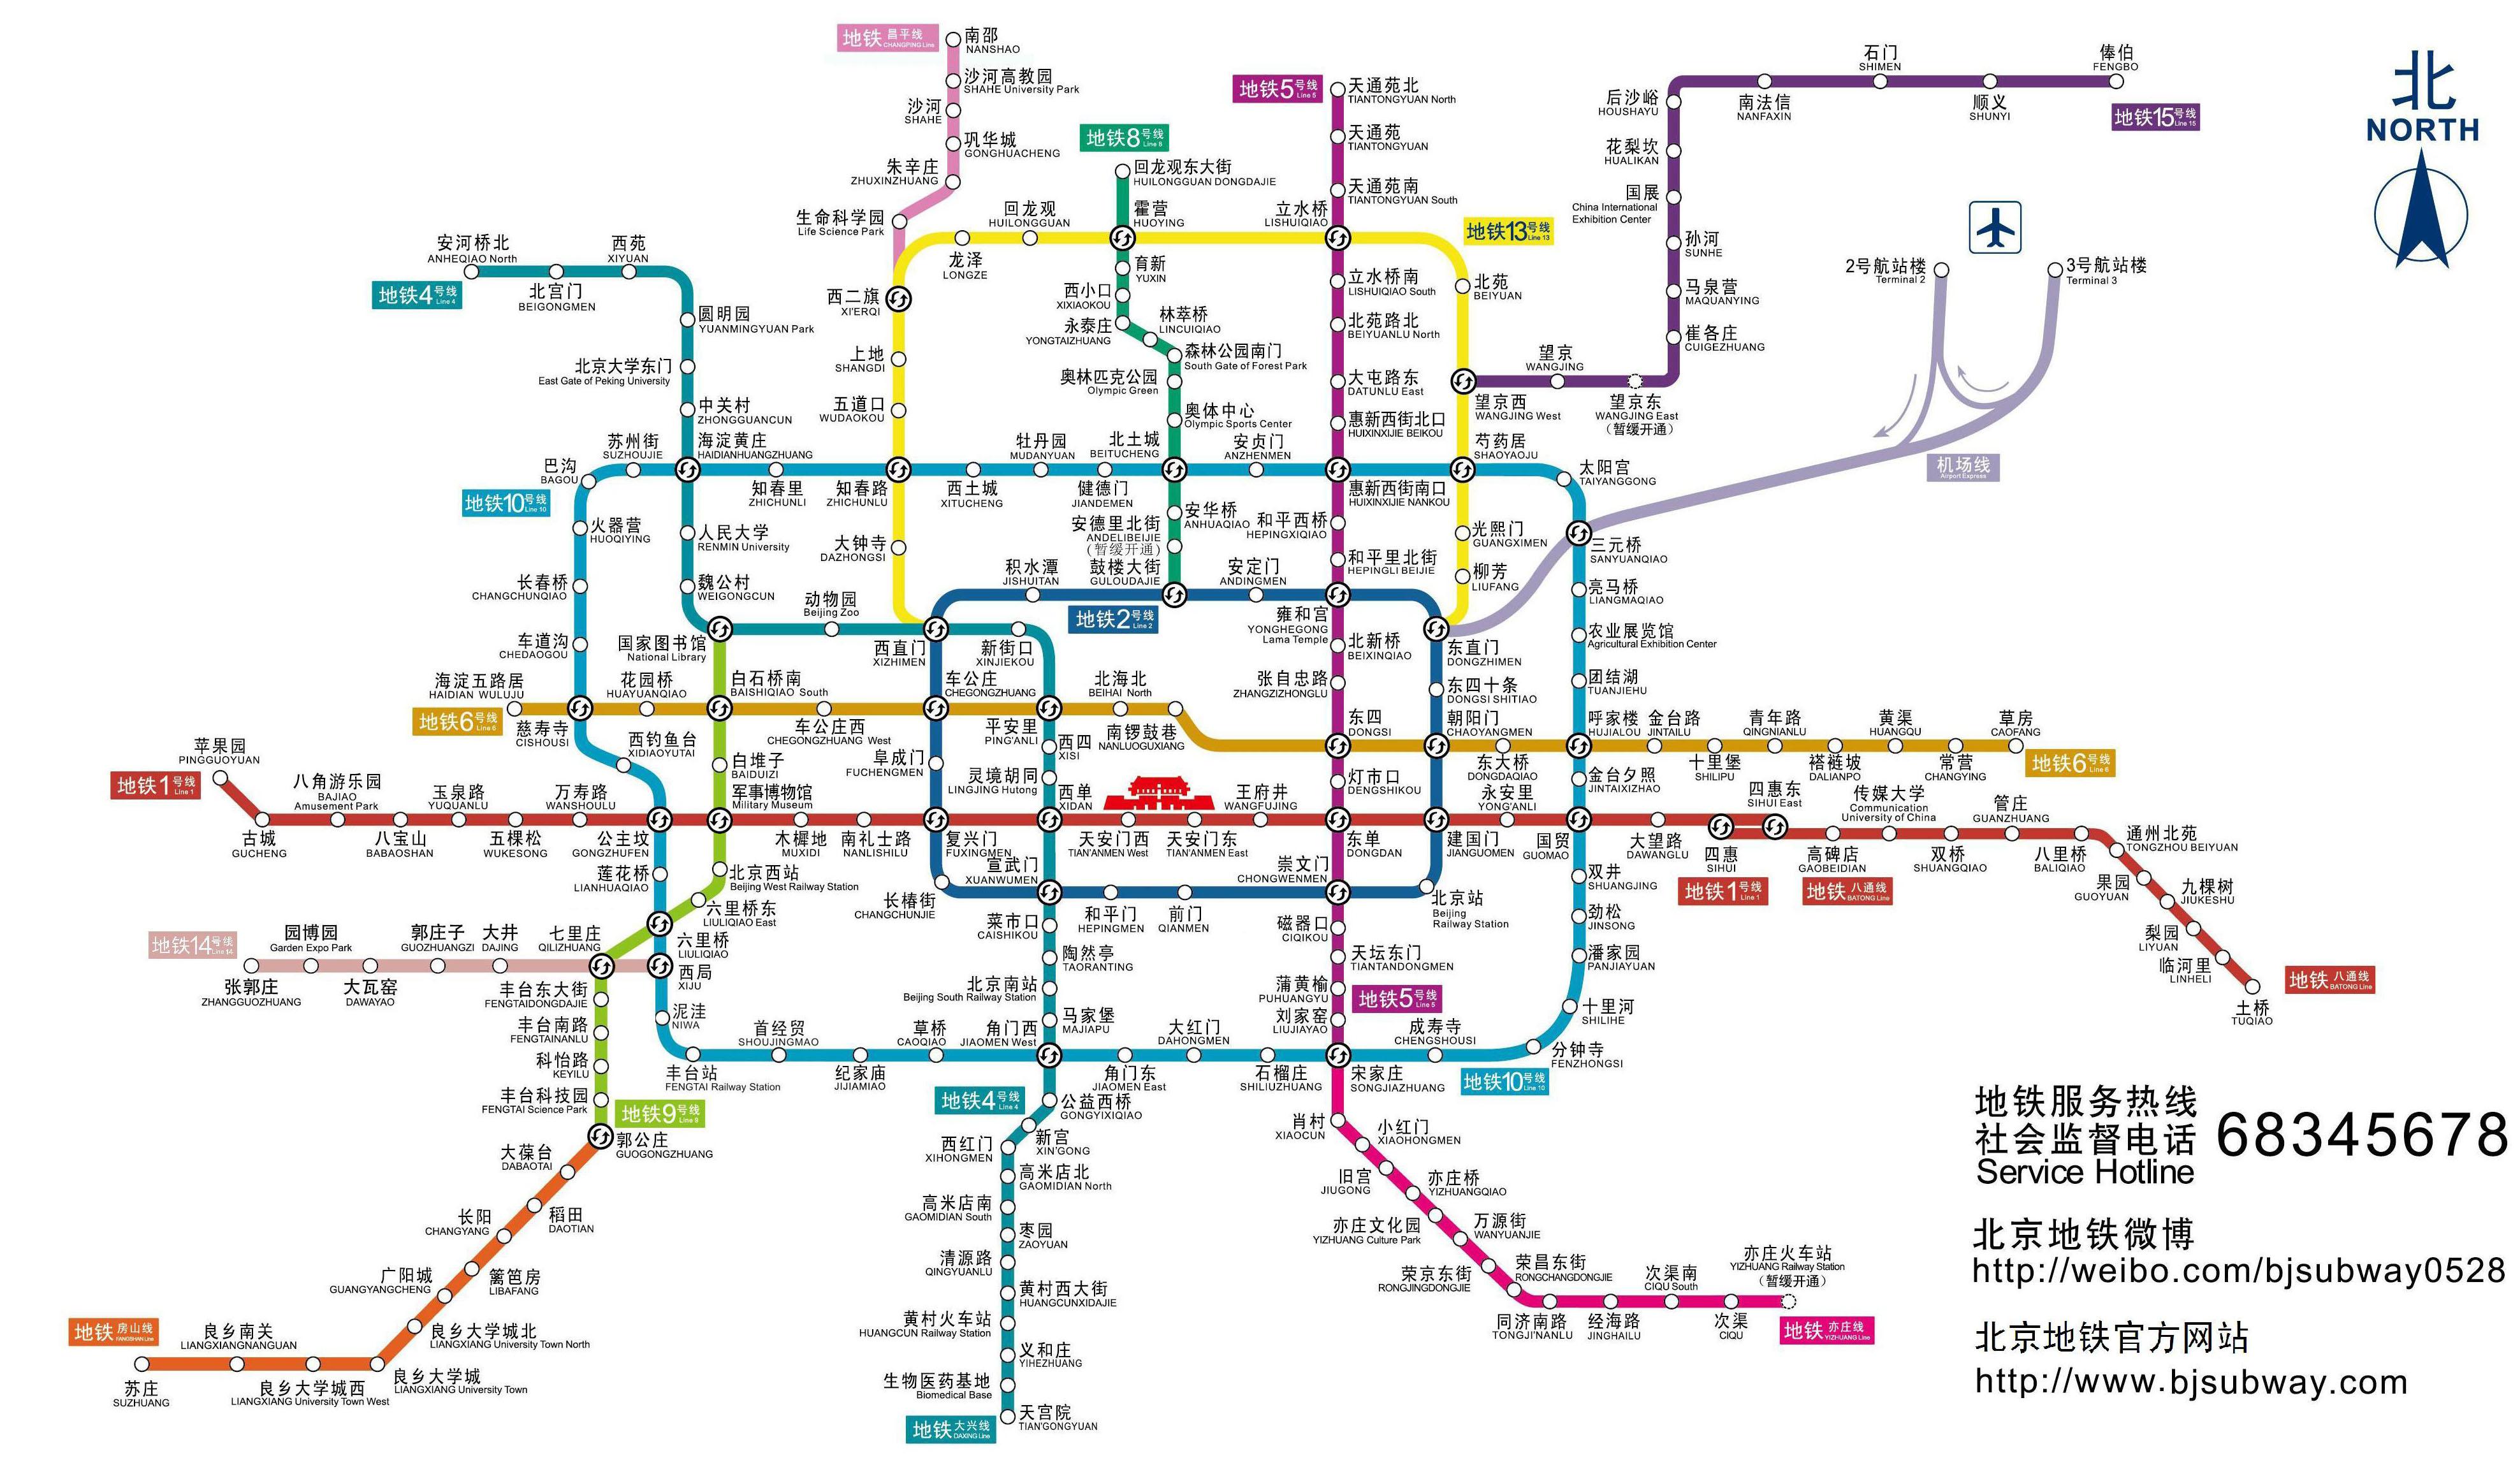 Karta Metro Pekin I Ee Opisanie Turizm V Kitae